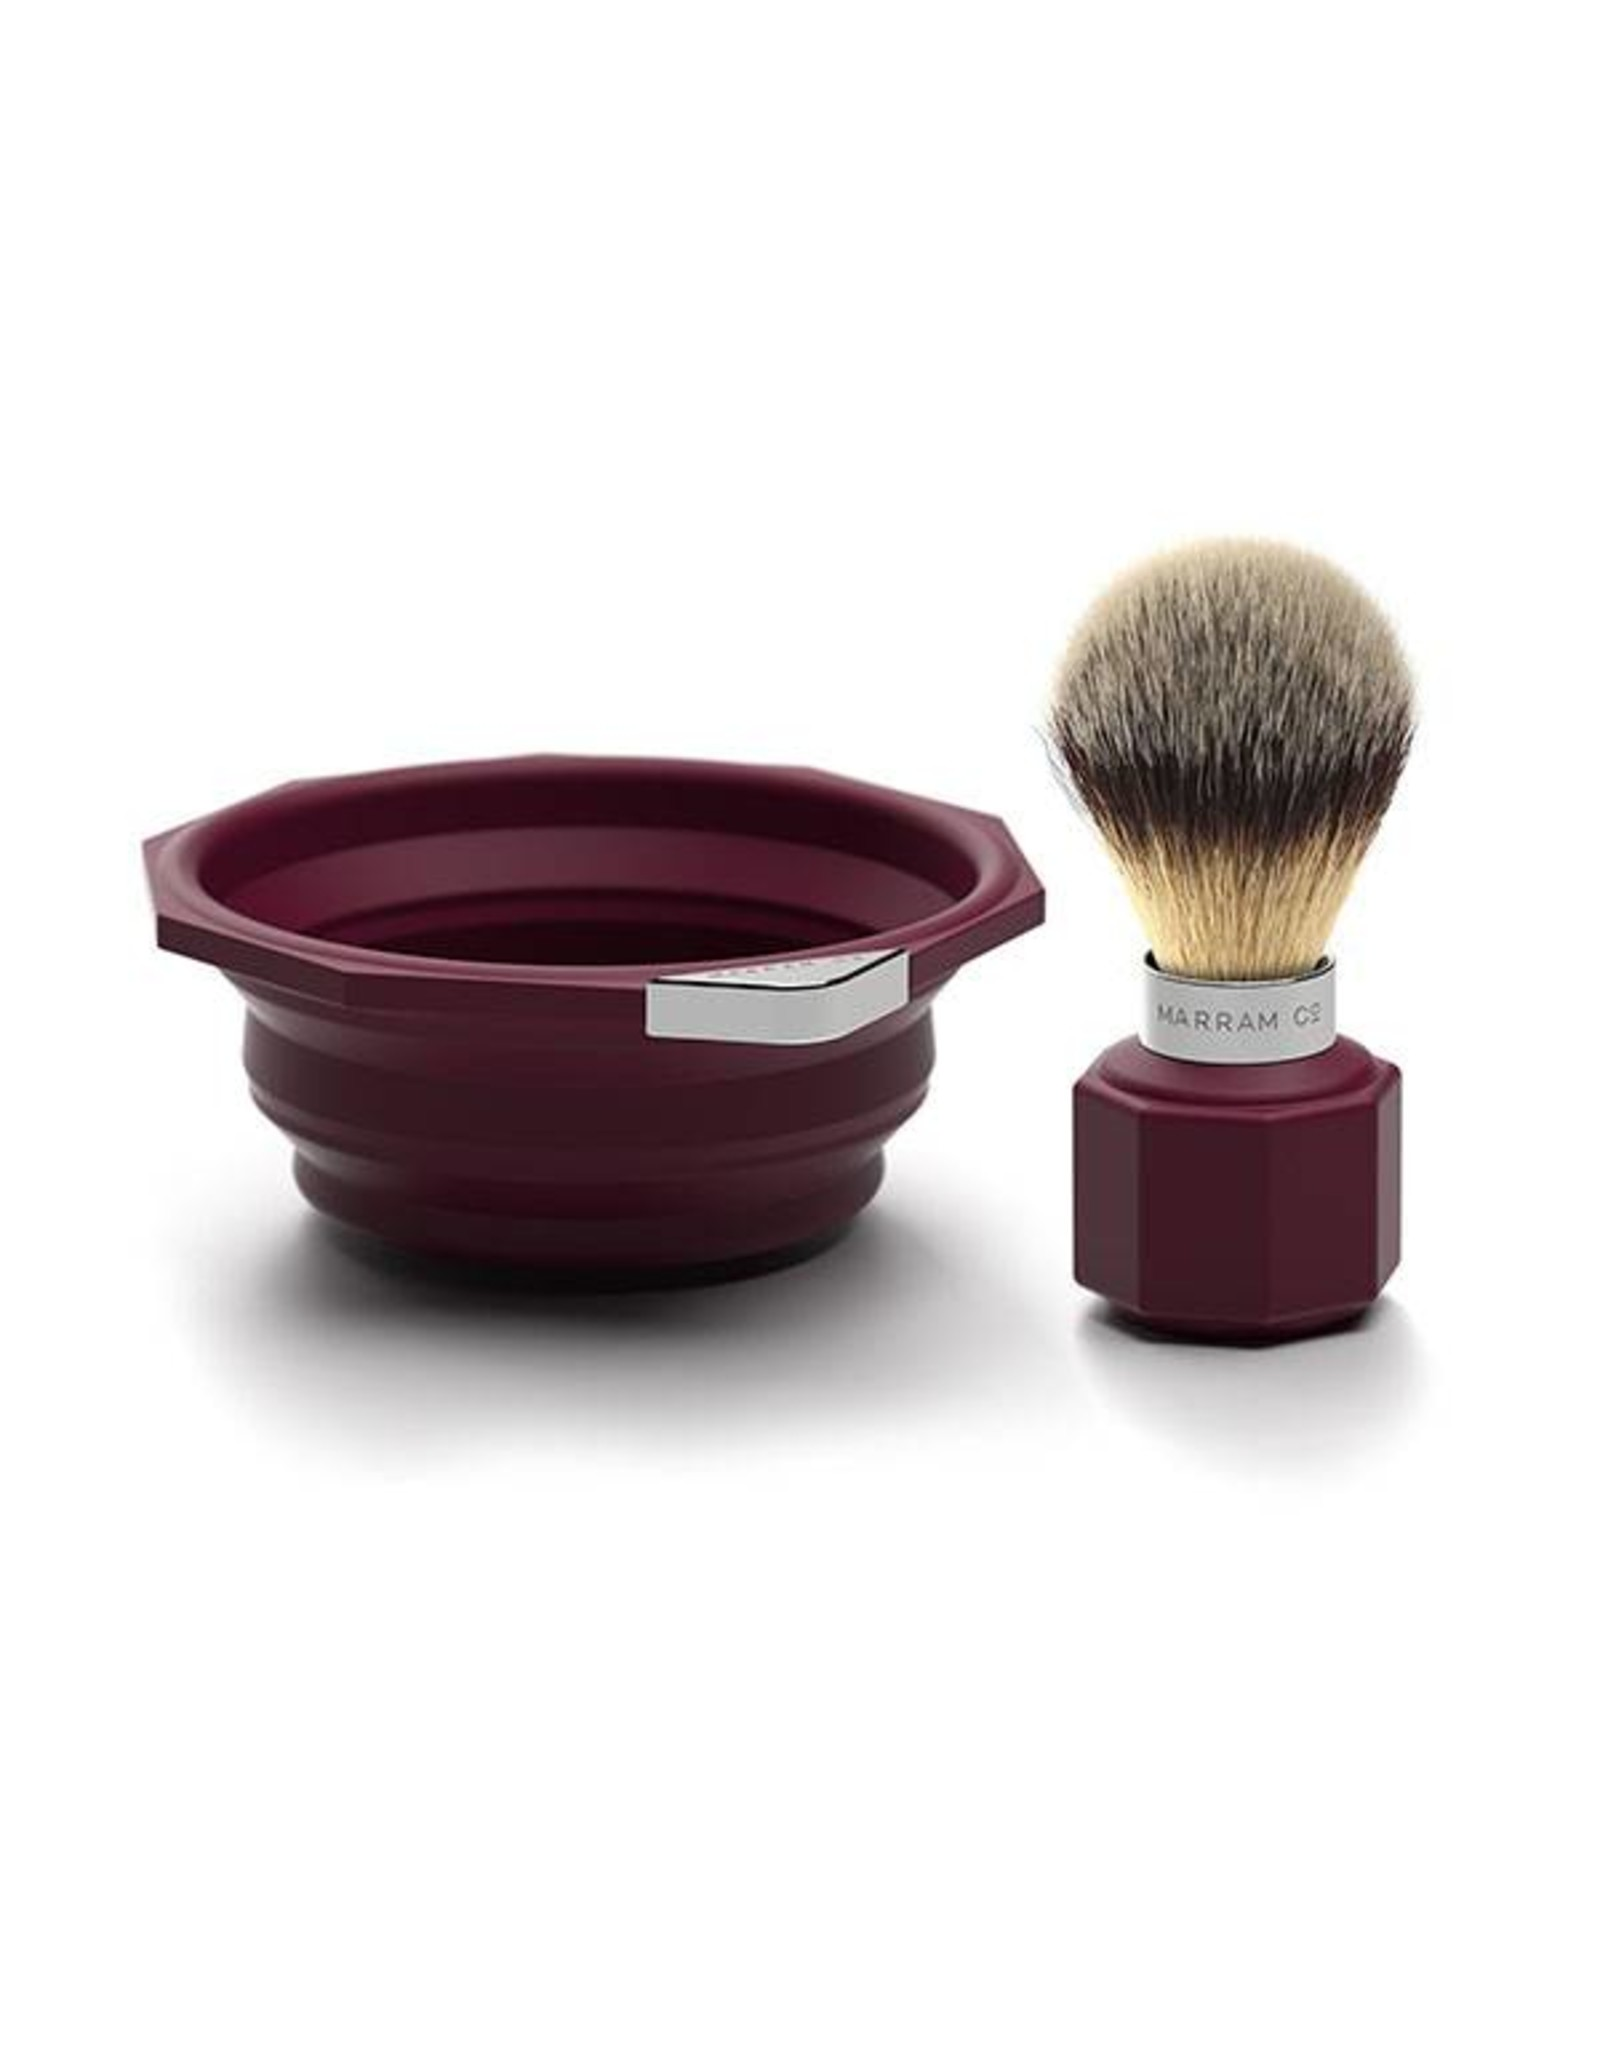 Marram Co POP! Travelling Shaving Brush and Dish   Burgundy